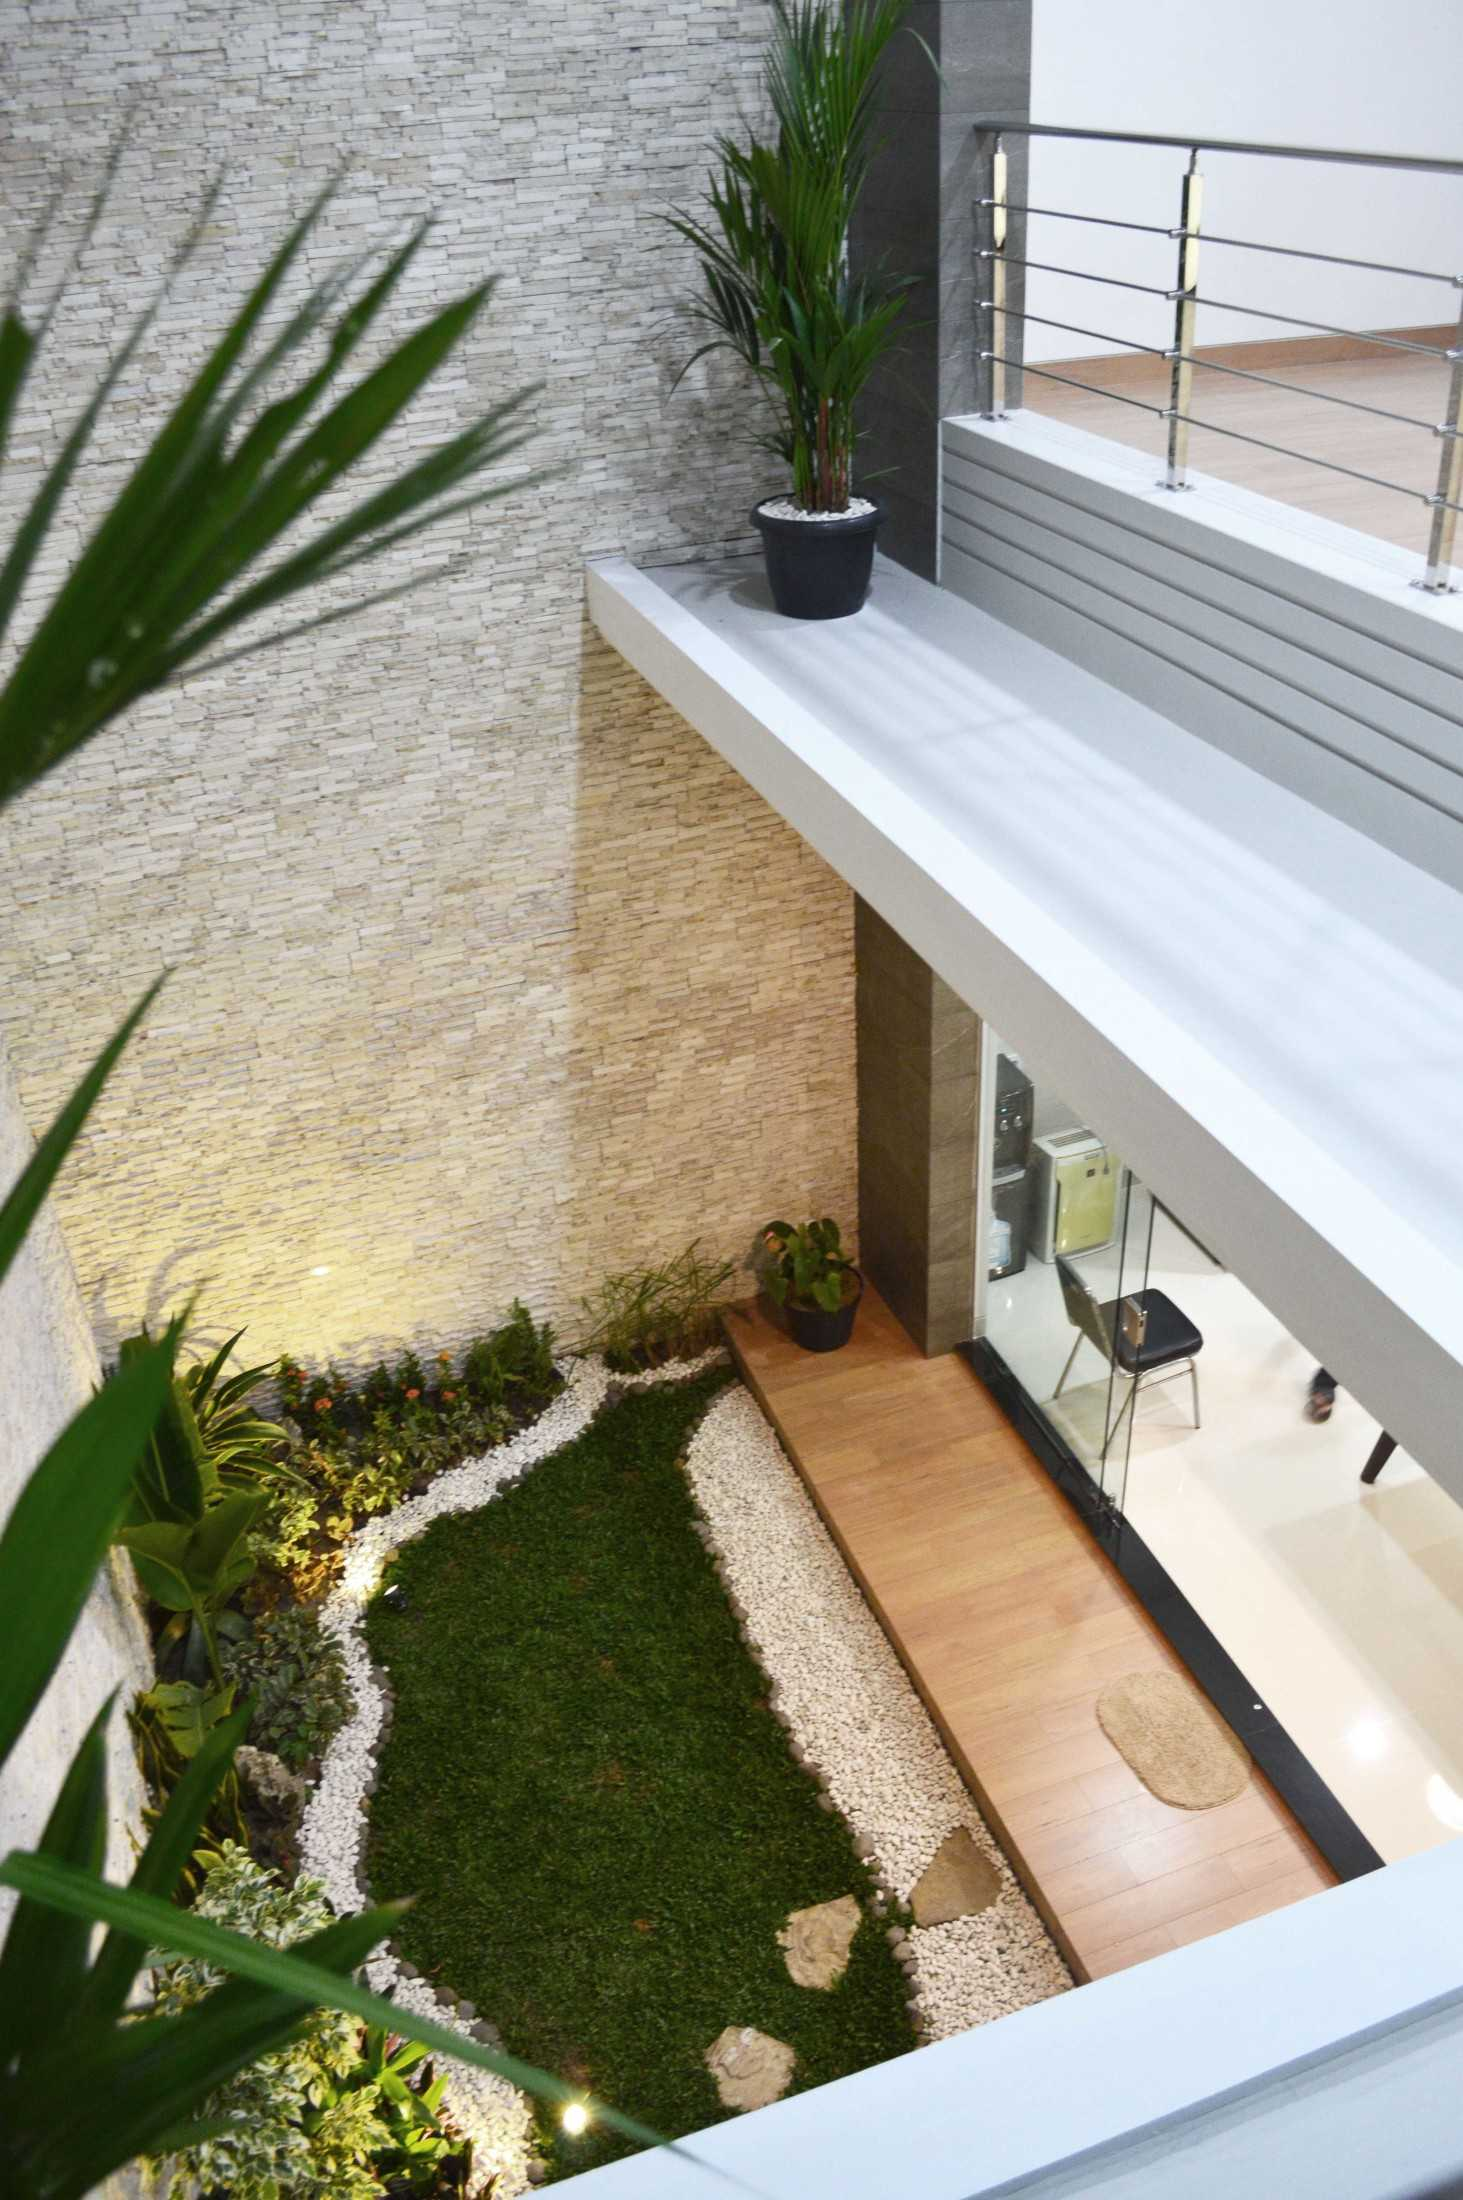 Conarch Studio Modern House With Natural Color Palette Surakarta, Kota Surakarta, Jawa Tengah, Indonesia Surakarta, Kota Surakarta, Jawa Tengah, Indonesia Indoor Garden  122981